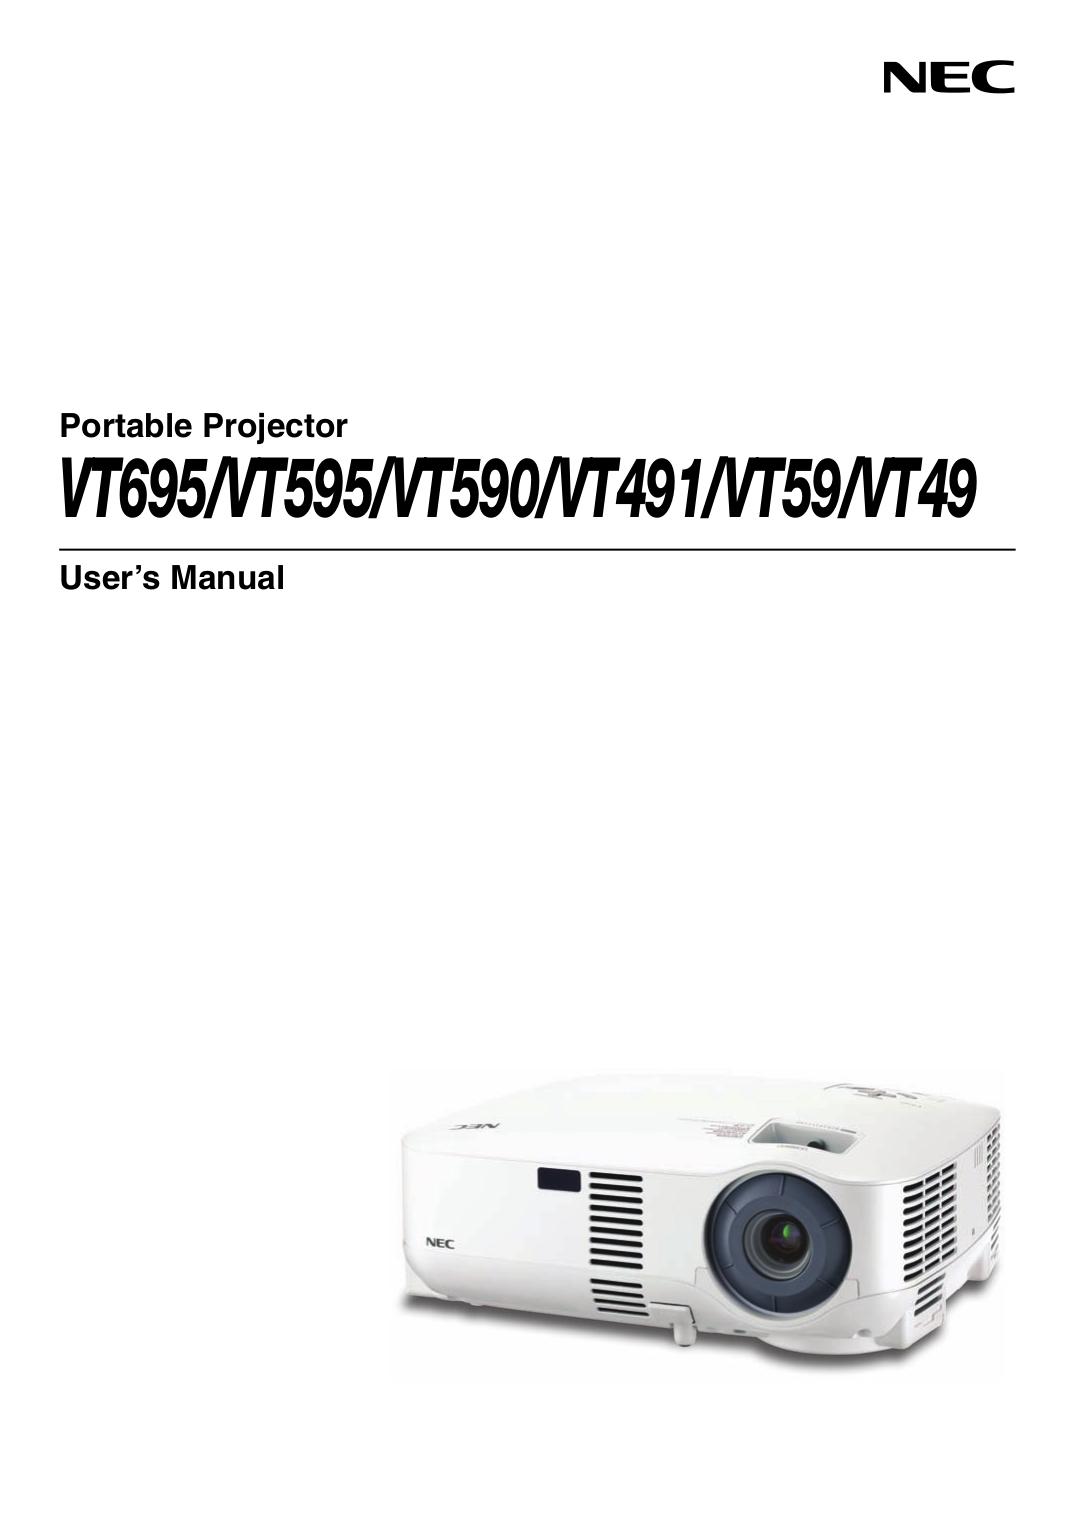 Download free pdf for nec vt59 projector manual.